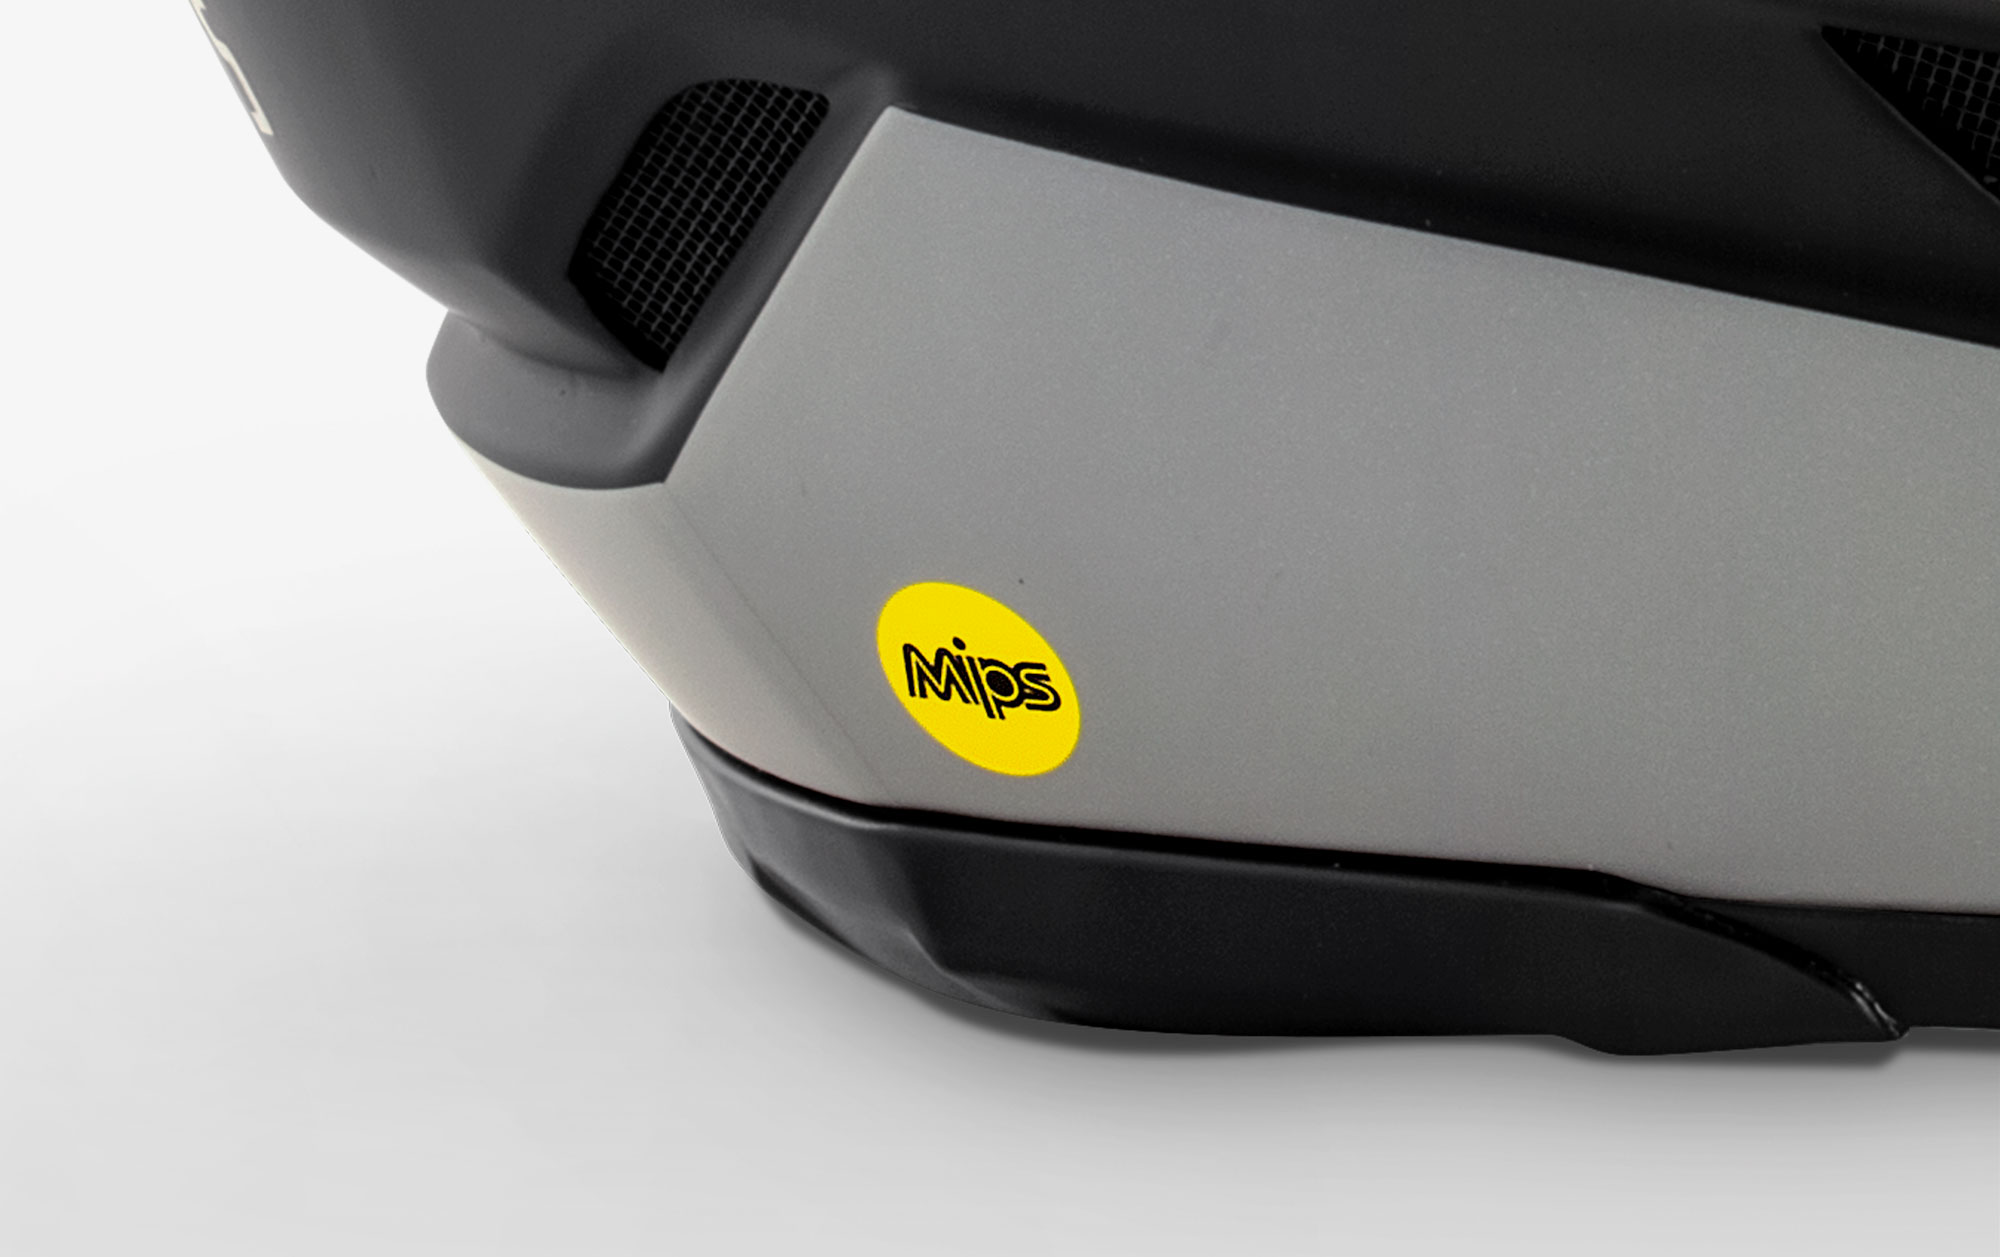 BLUEGRASS Legit Carbon Mips Downhill, BMX and Trail Helmet Brain Protection System